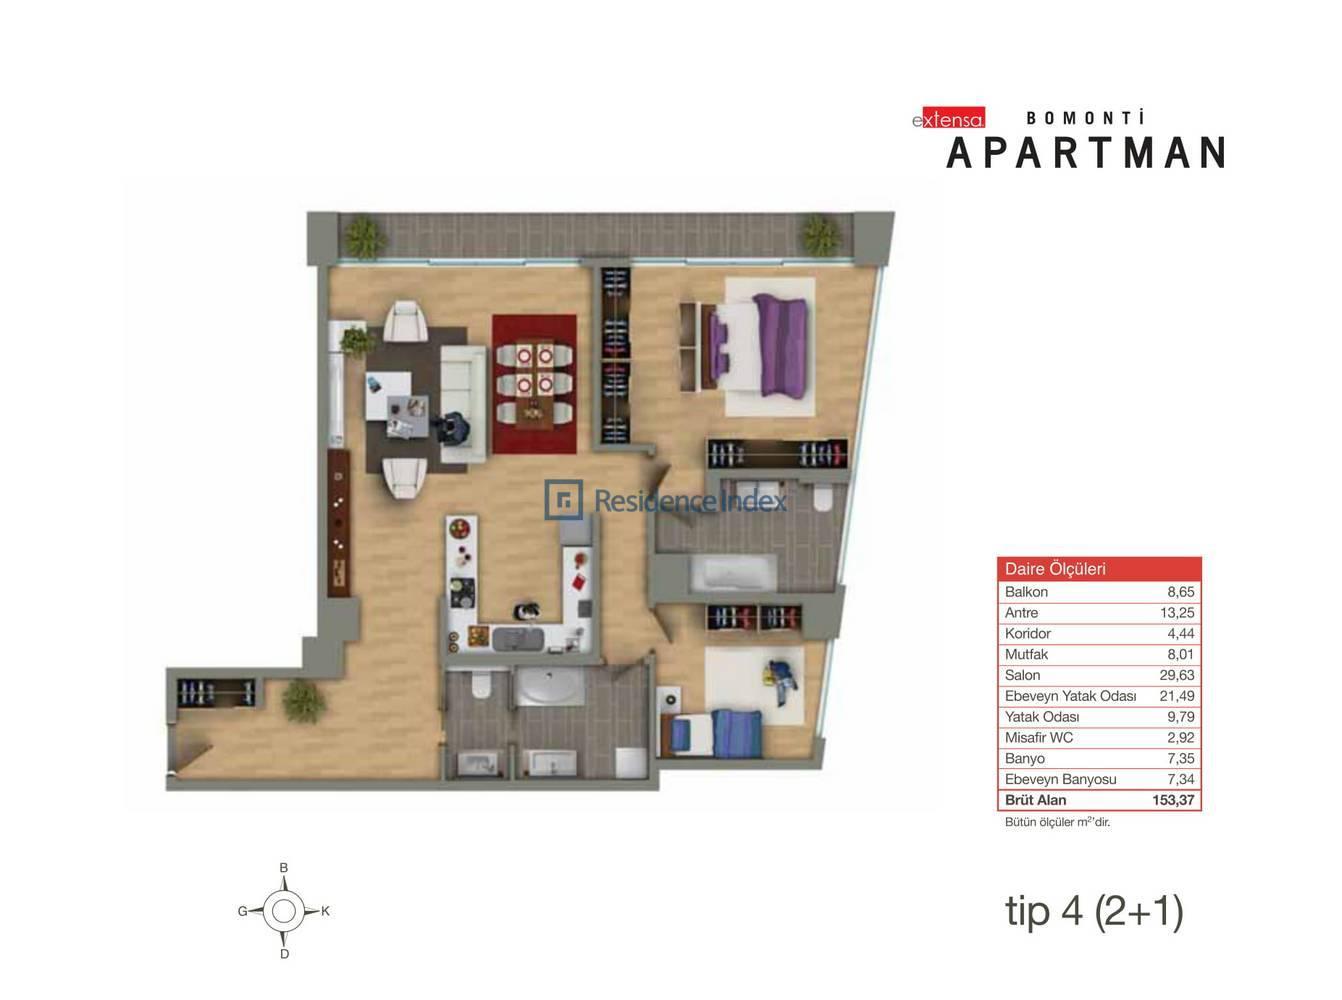 Bomonti Apartmanı Tip 4